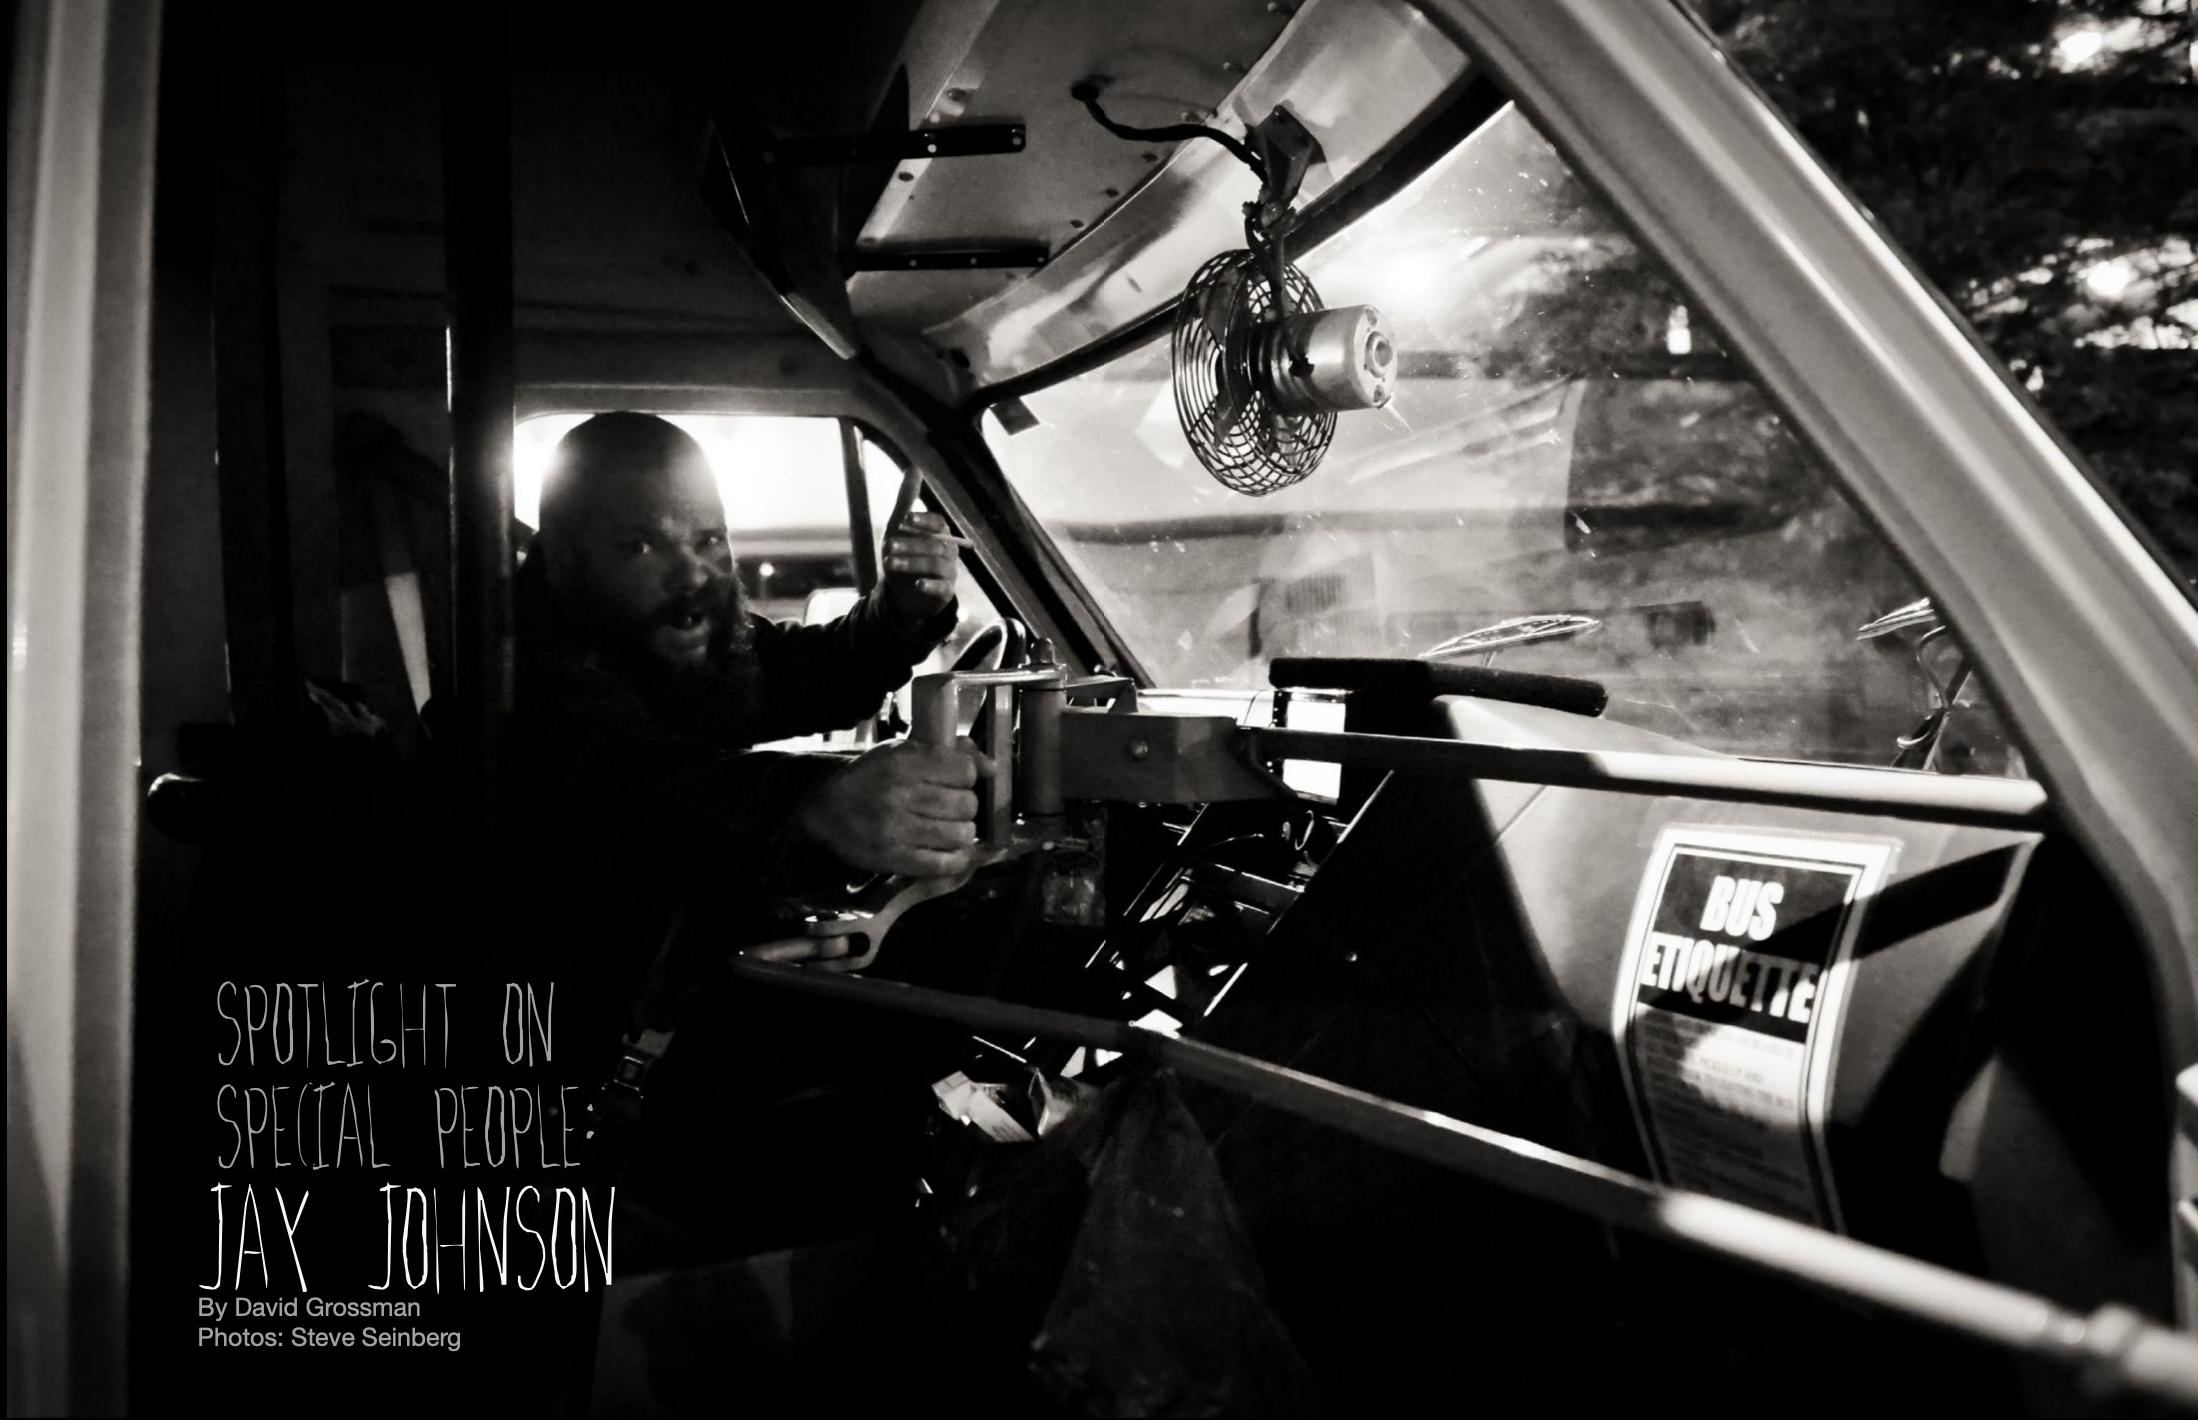 Jay Jonhson